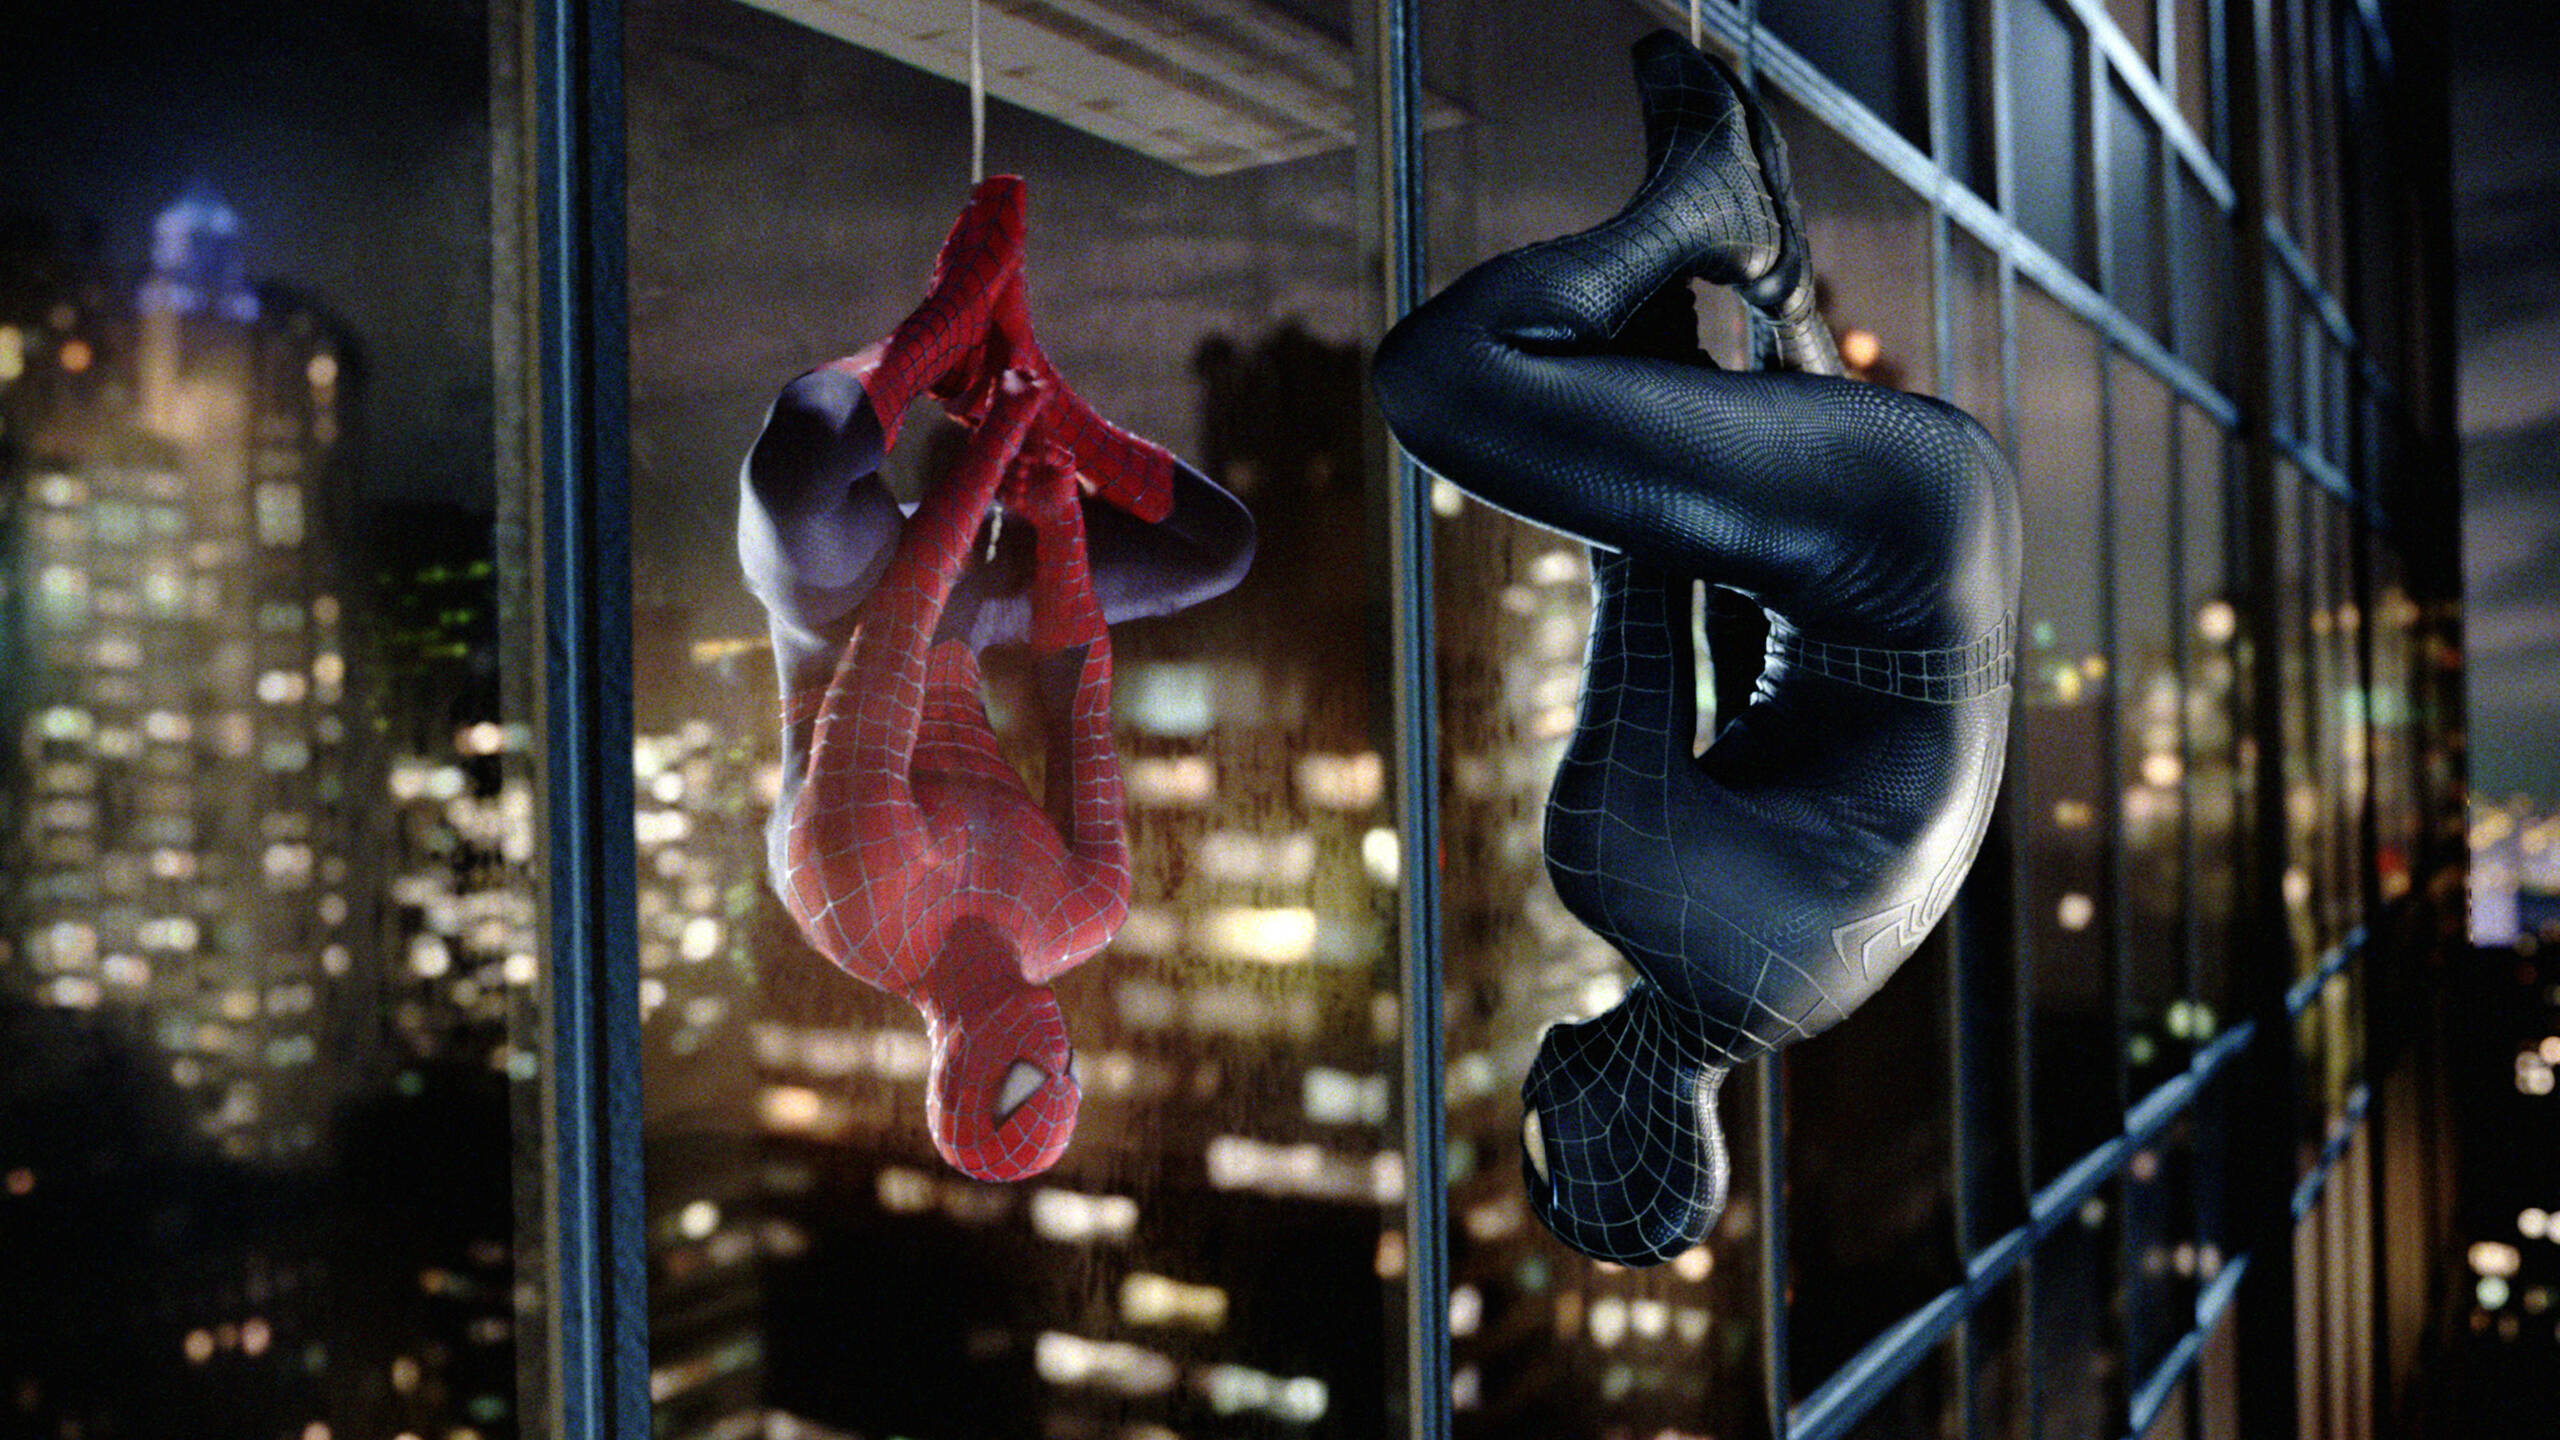 2560x1440 Spiderman 3 Poster 1440p Resolution Hd 4k